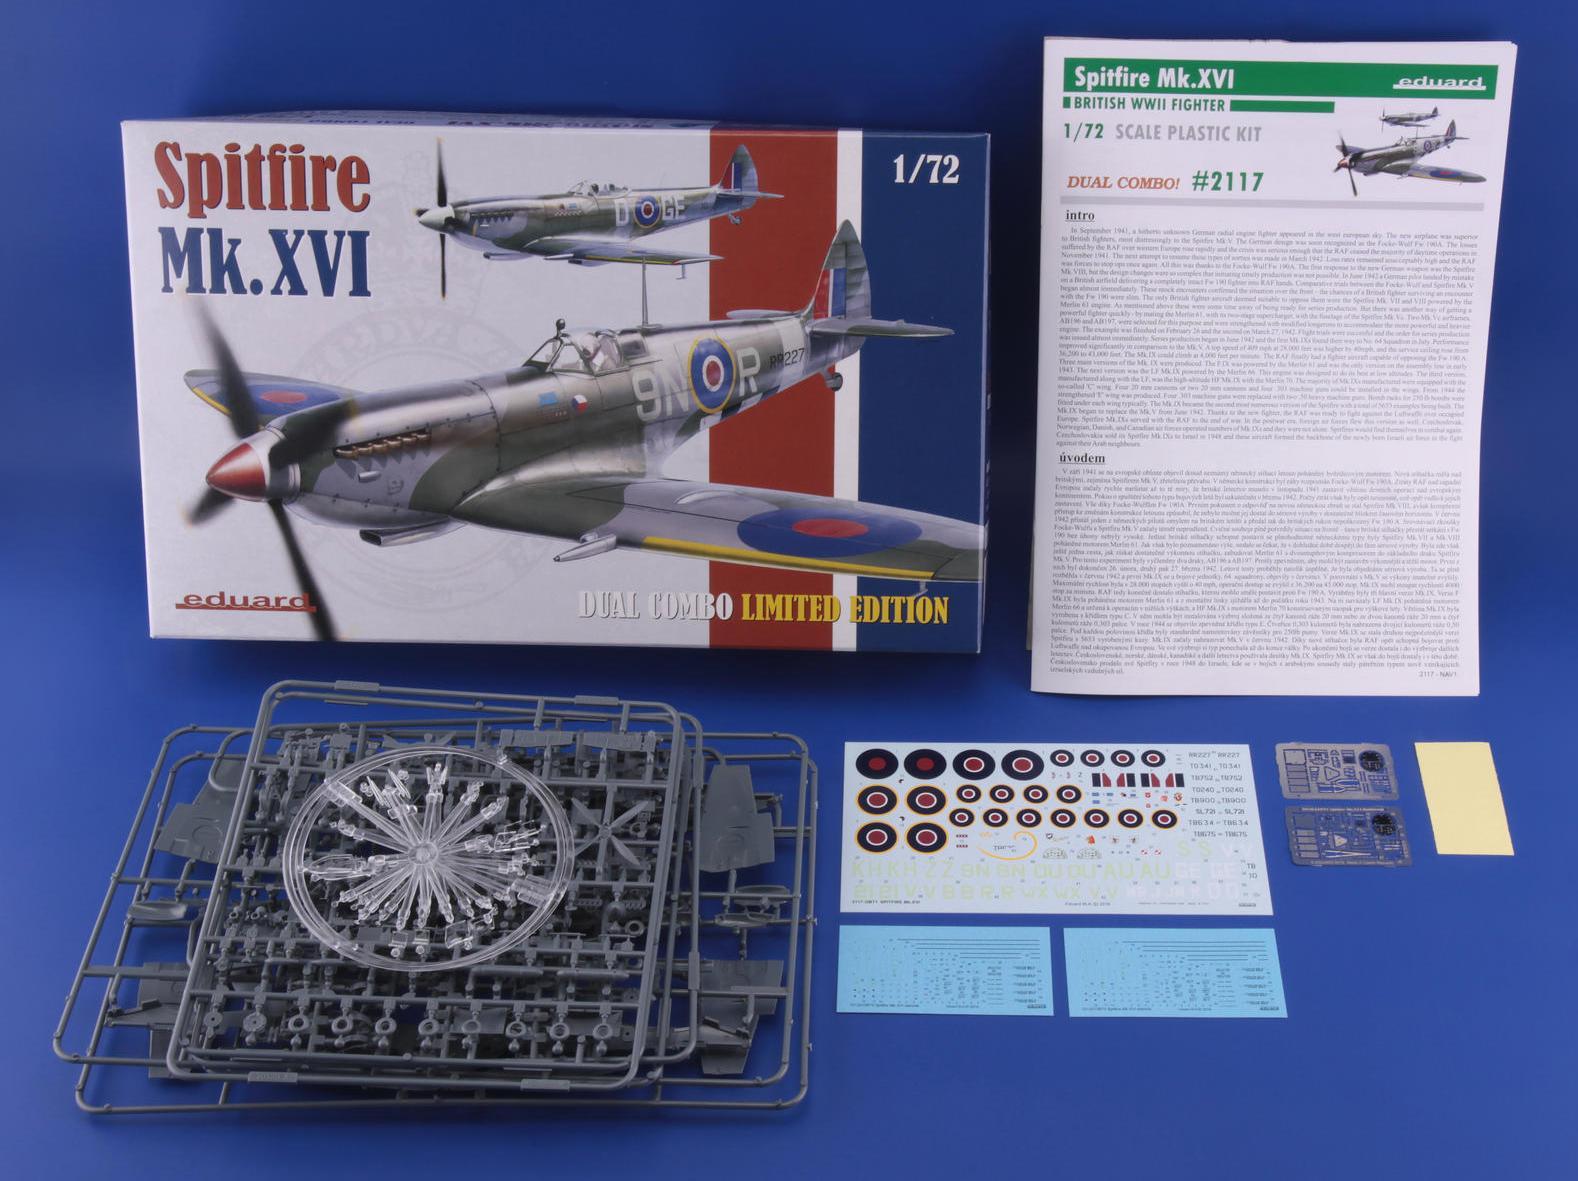 Eduard-2117-Spitfire-Mk.-XVI-Dual-Combo-Schachtelinhalt SUPERMARINE SPITFIRE Mk.XVI IN 1:72 ALS DUAL COMBO VON EDUARD #2117